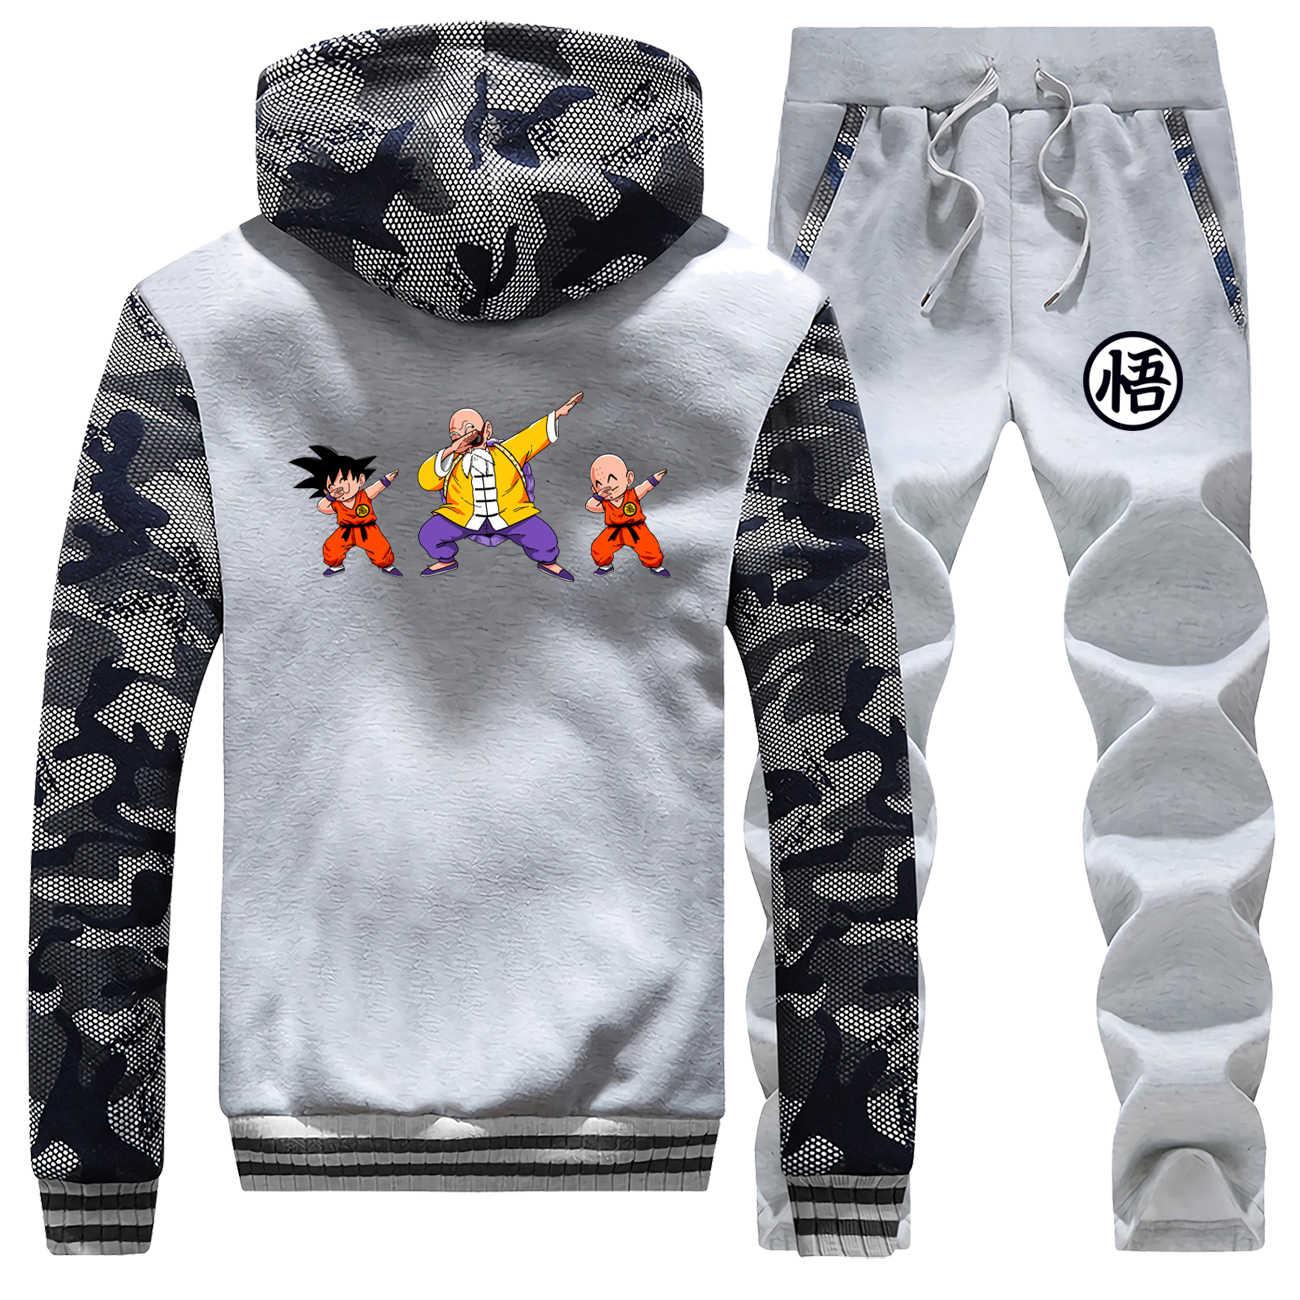 Dragon Ball Z Lustige Männlichen Set Hüfte Hop Master Roshi Camo Dicke männer Voller Anzug Trainingsanzug Casual Fleece Herren winter Jacke Mann Tragen